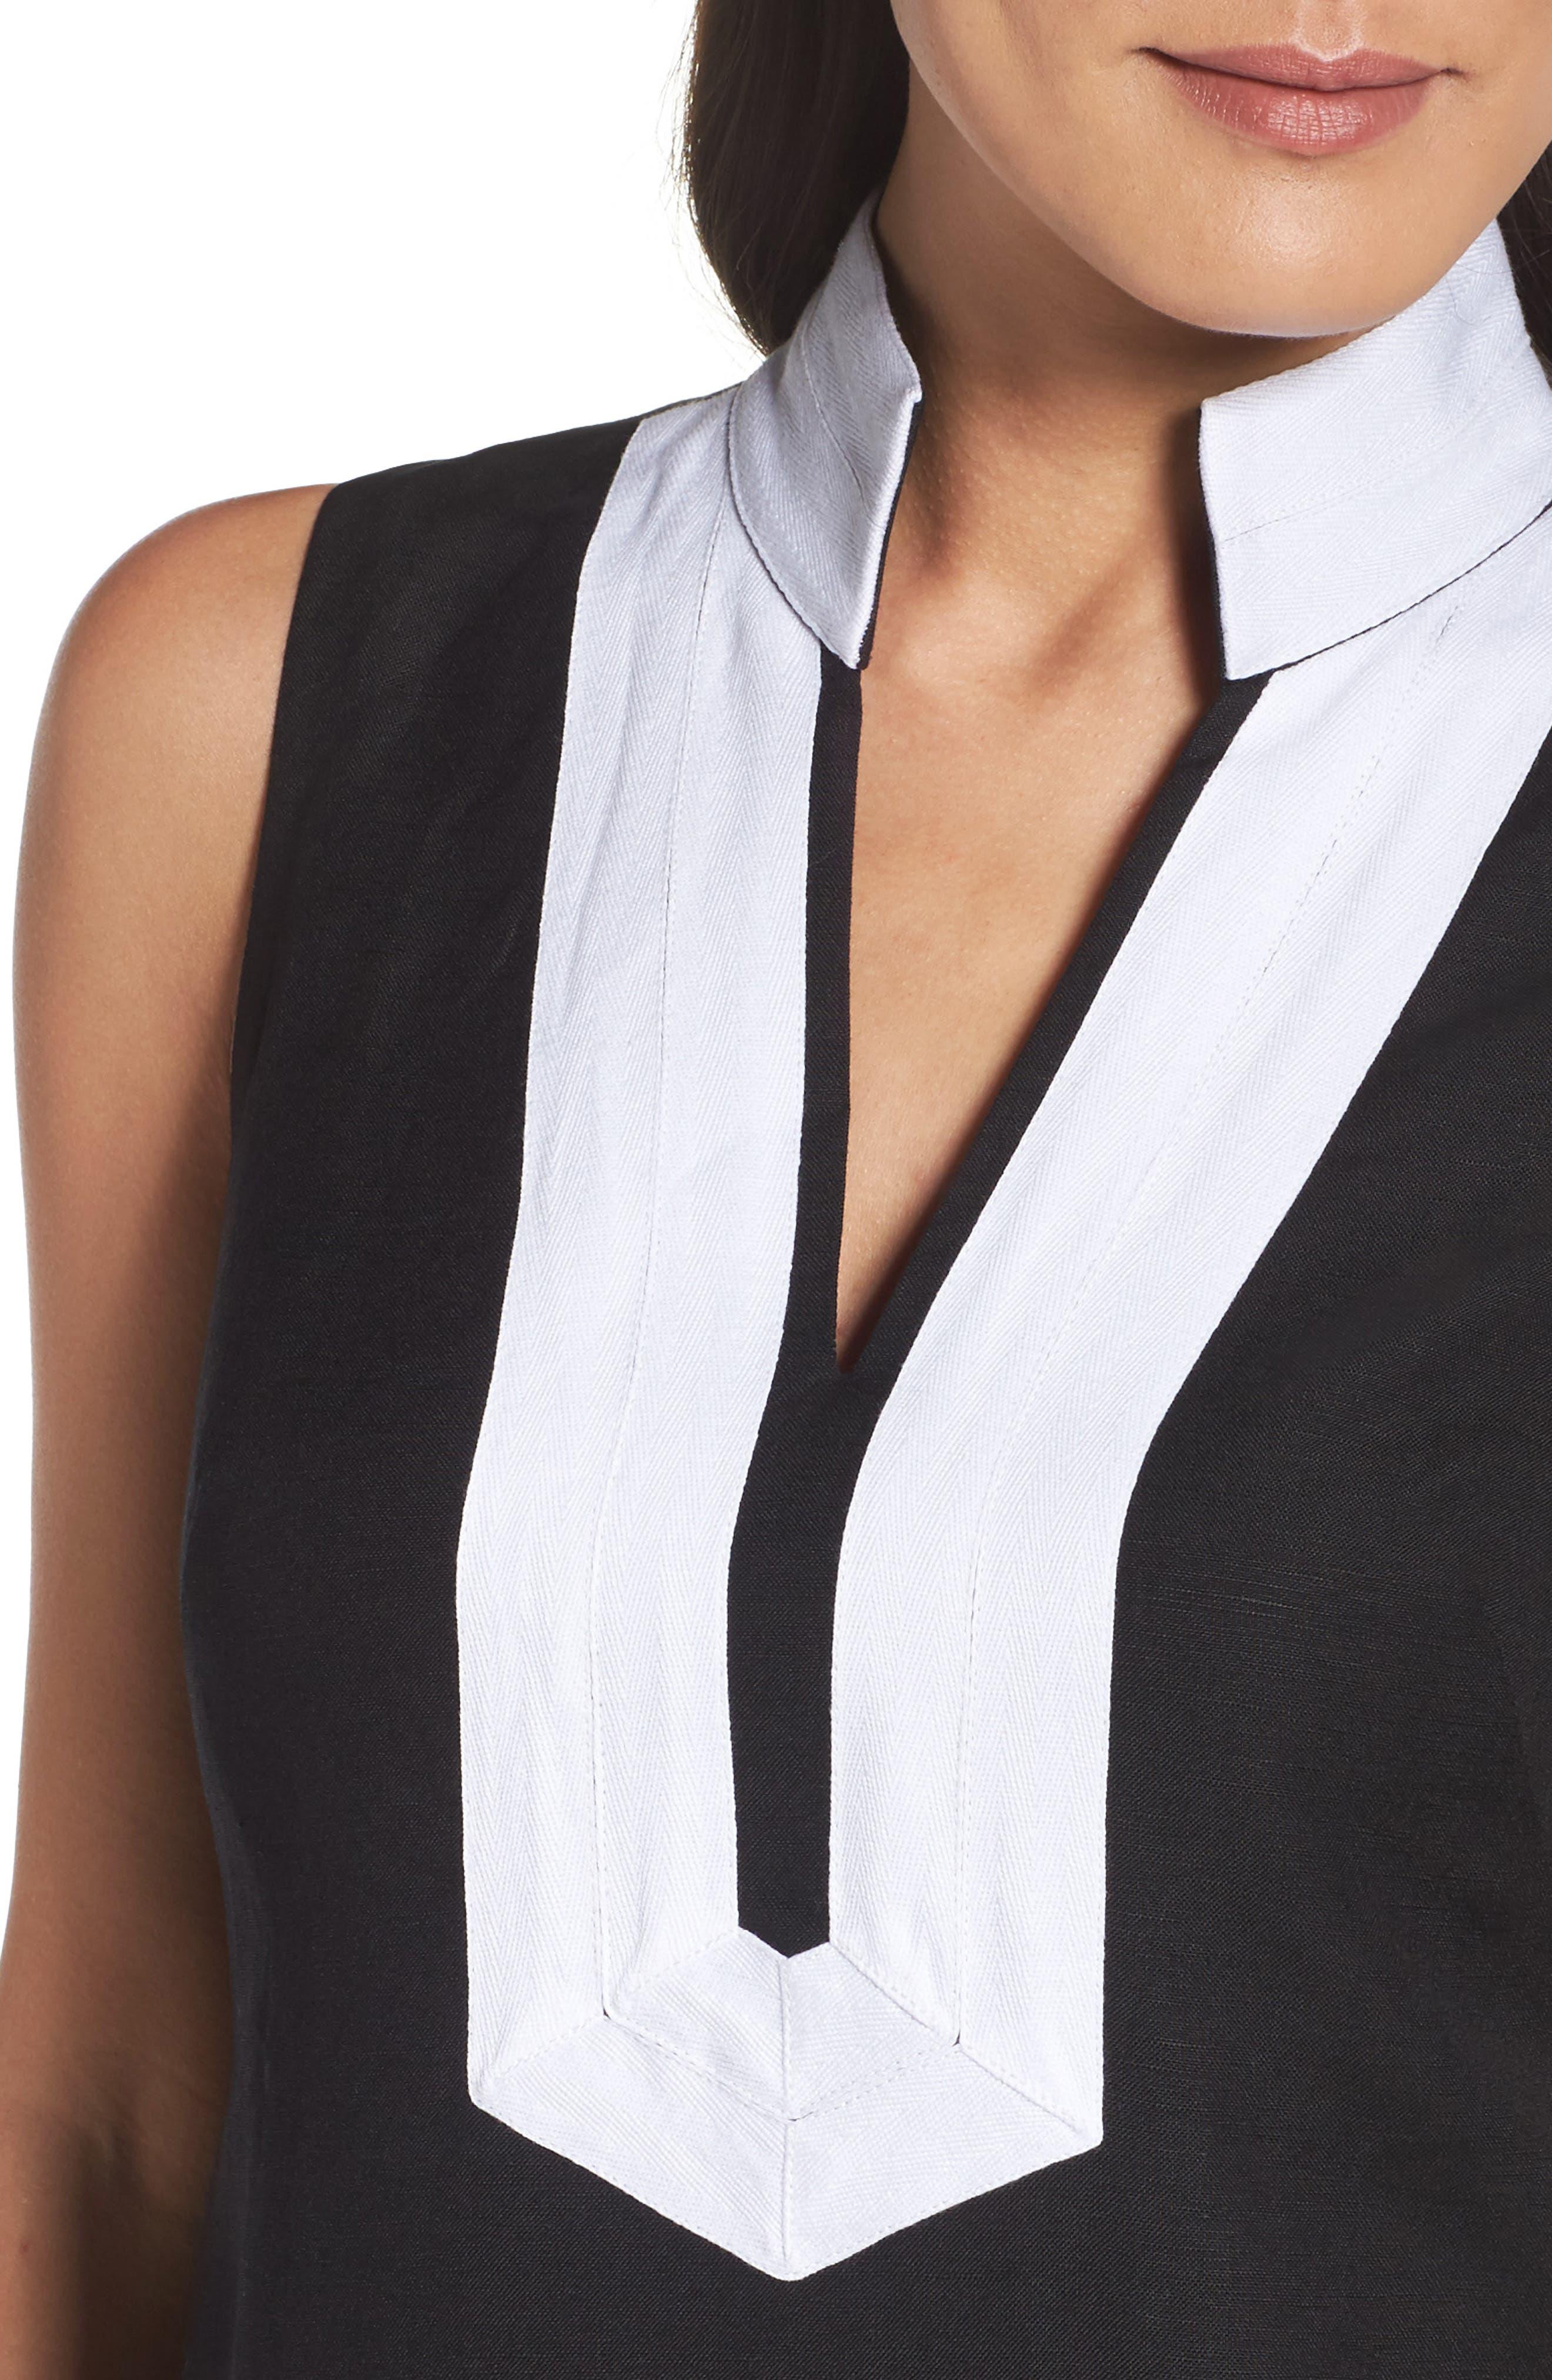 Linen Blend Sheath Dress,                             Alternate thumbnail 4, color,                             Black/ Ivory